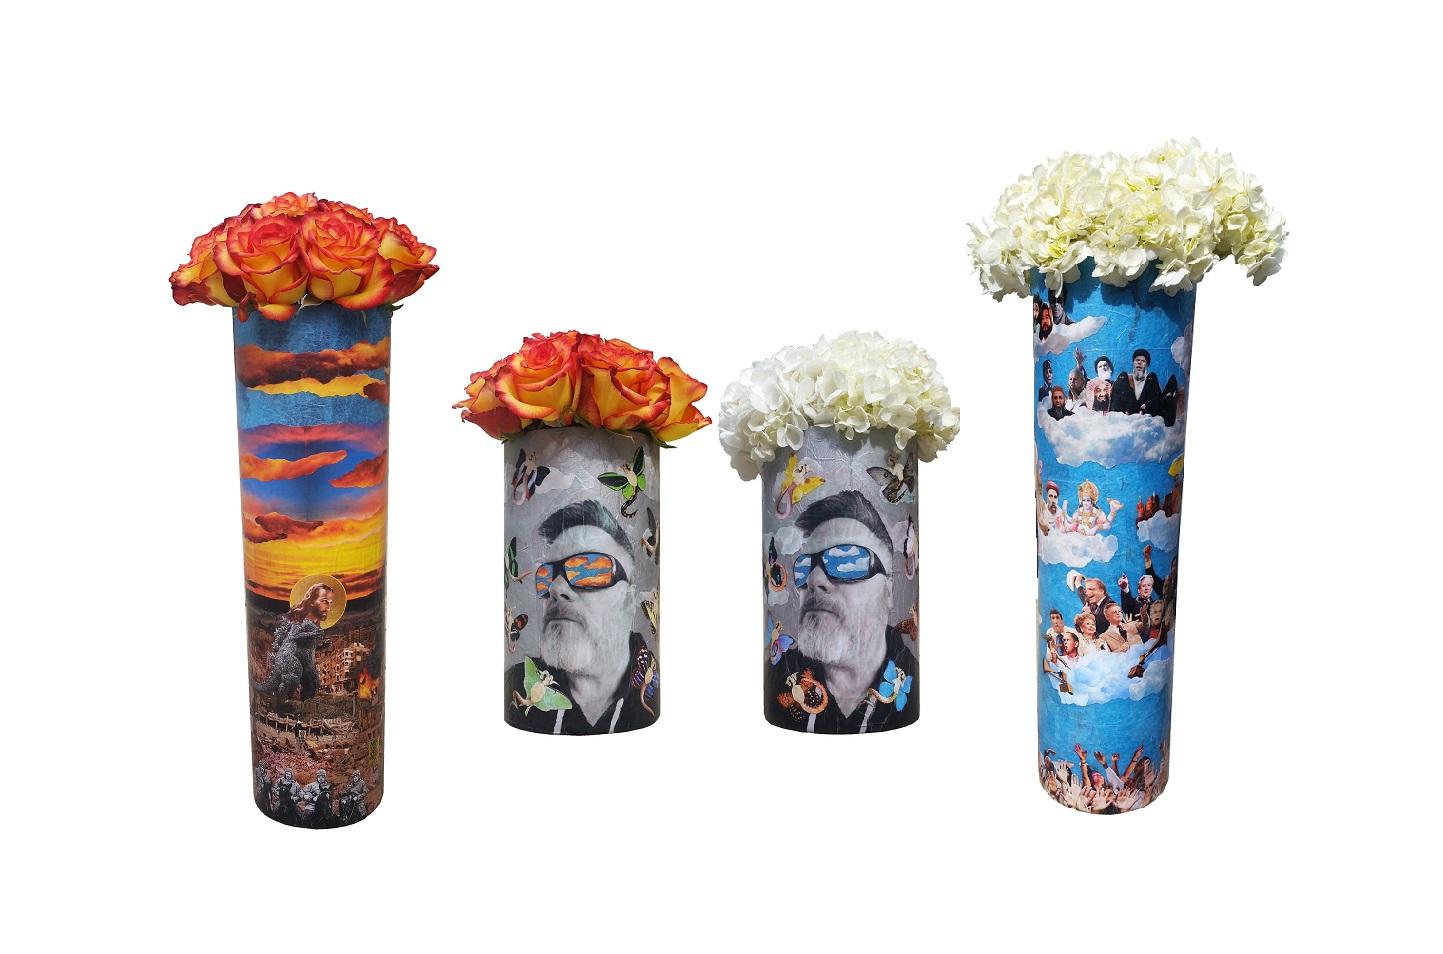 Themed Vases (details), 2016.